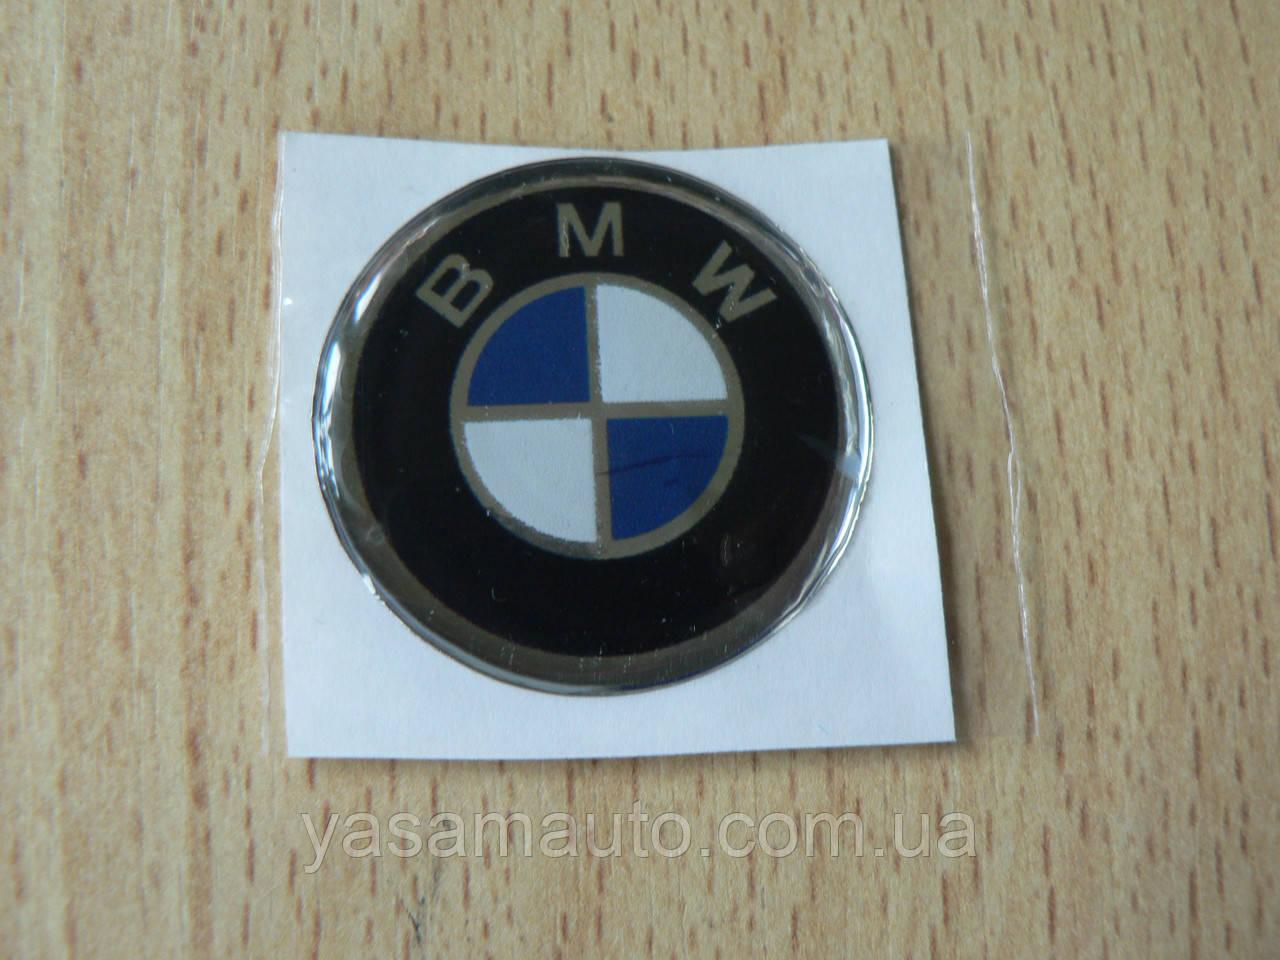 Наклейка s круглая BMW 30х30х1.2мм силиконовая эмблема логотип марка бренд в круге на авто 3М БМВ